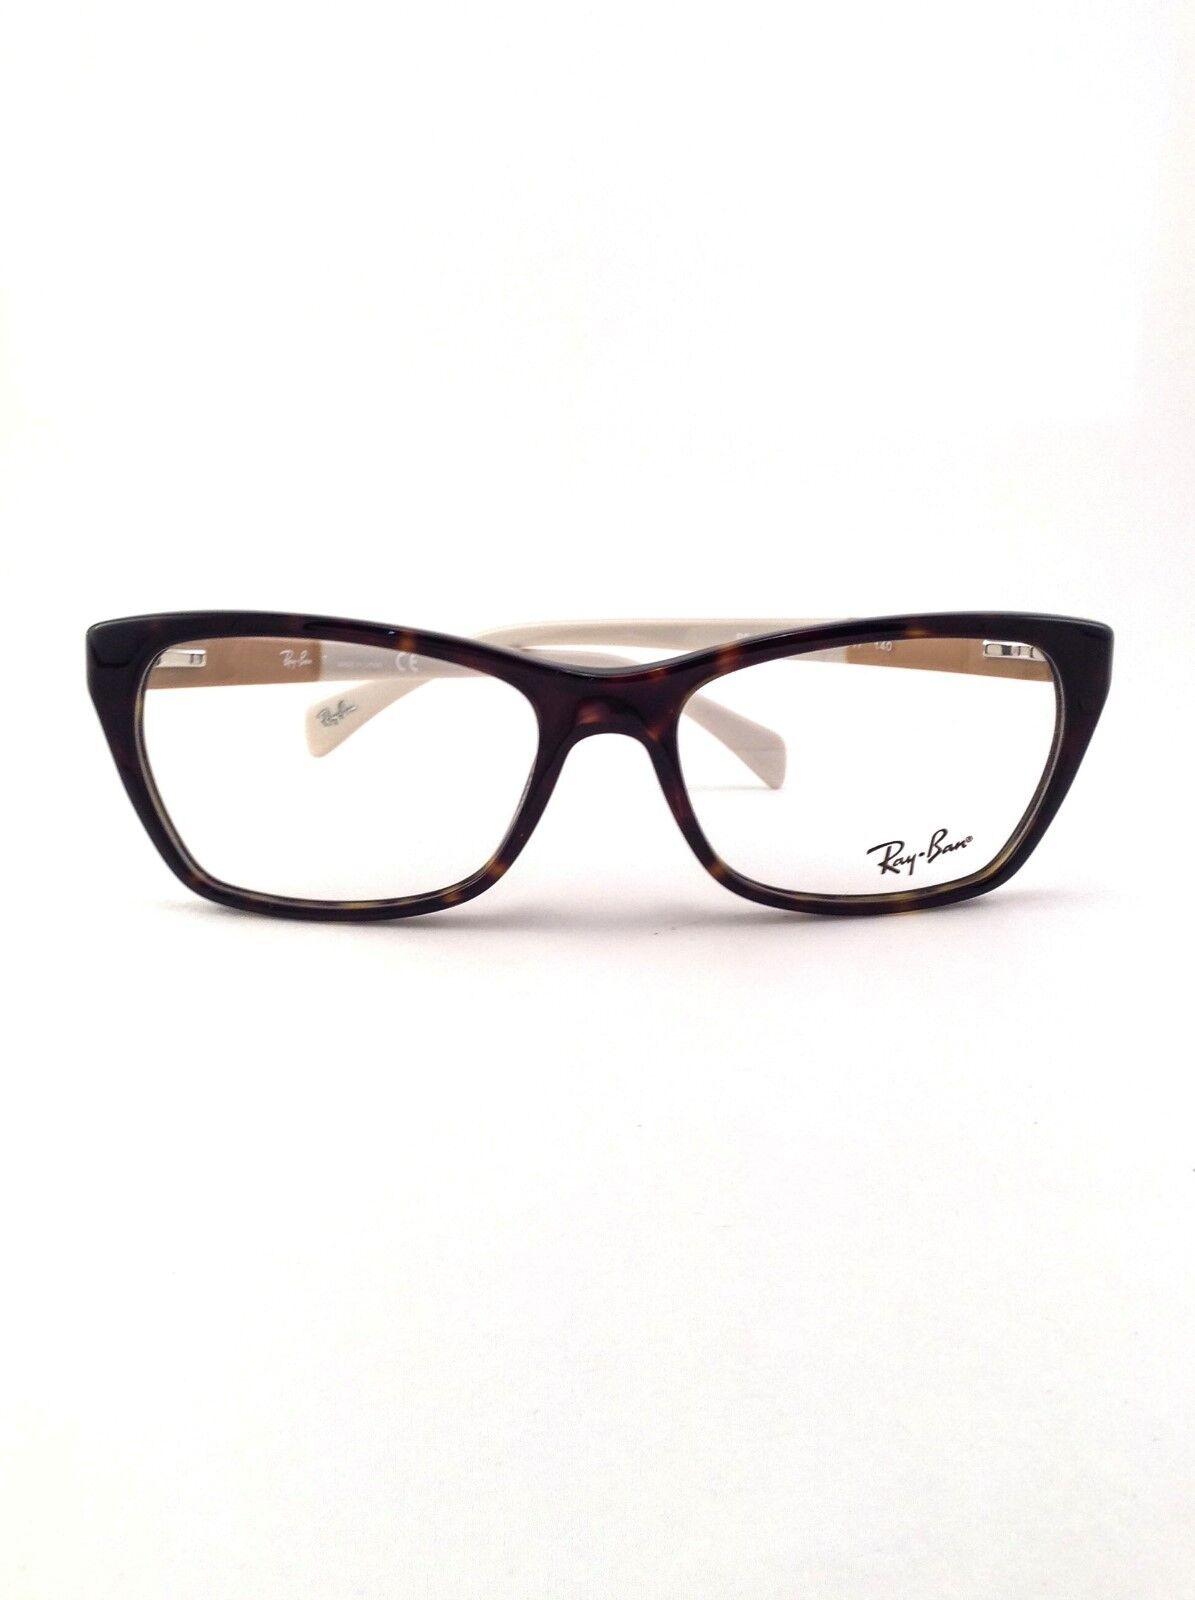 picture 1 of 6 - Ebay Eyeglasses Frames